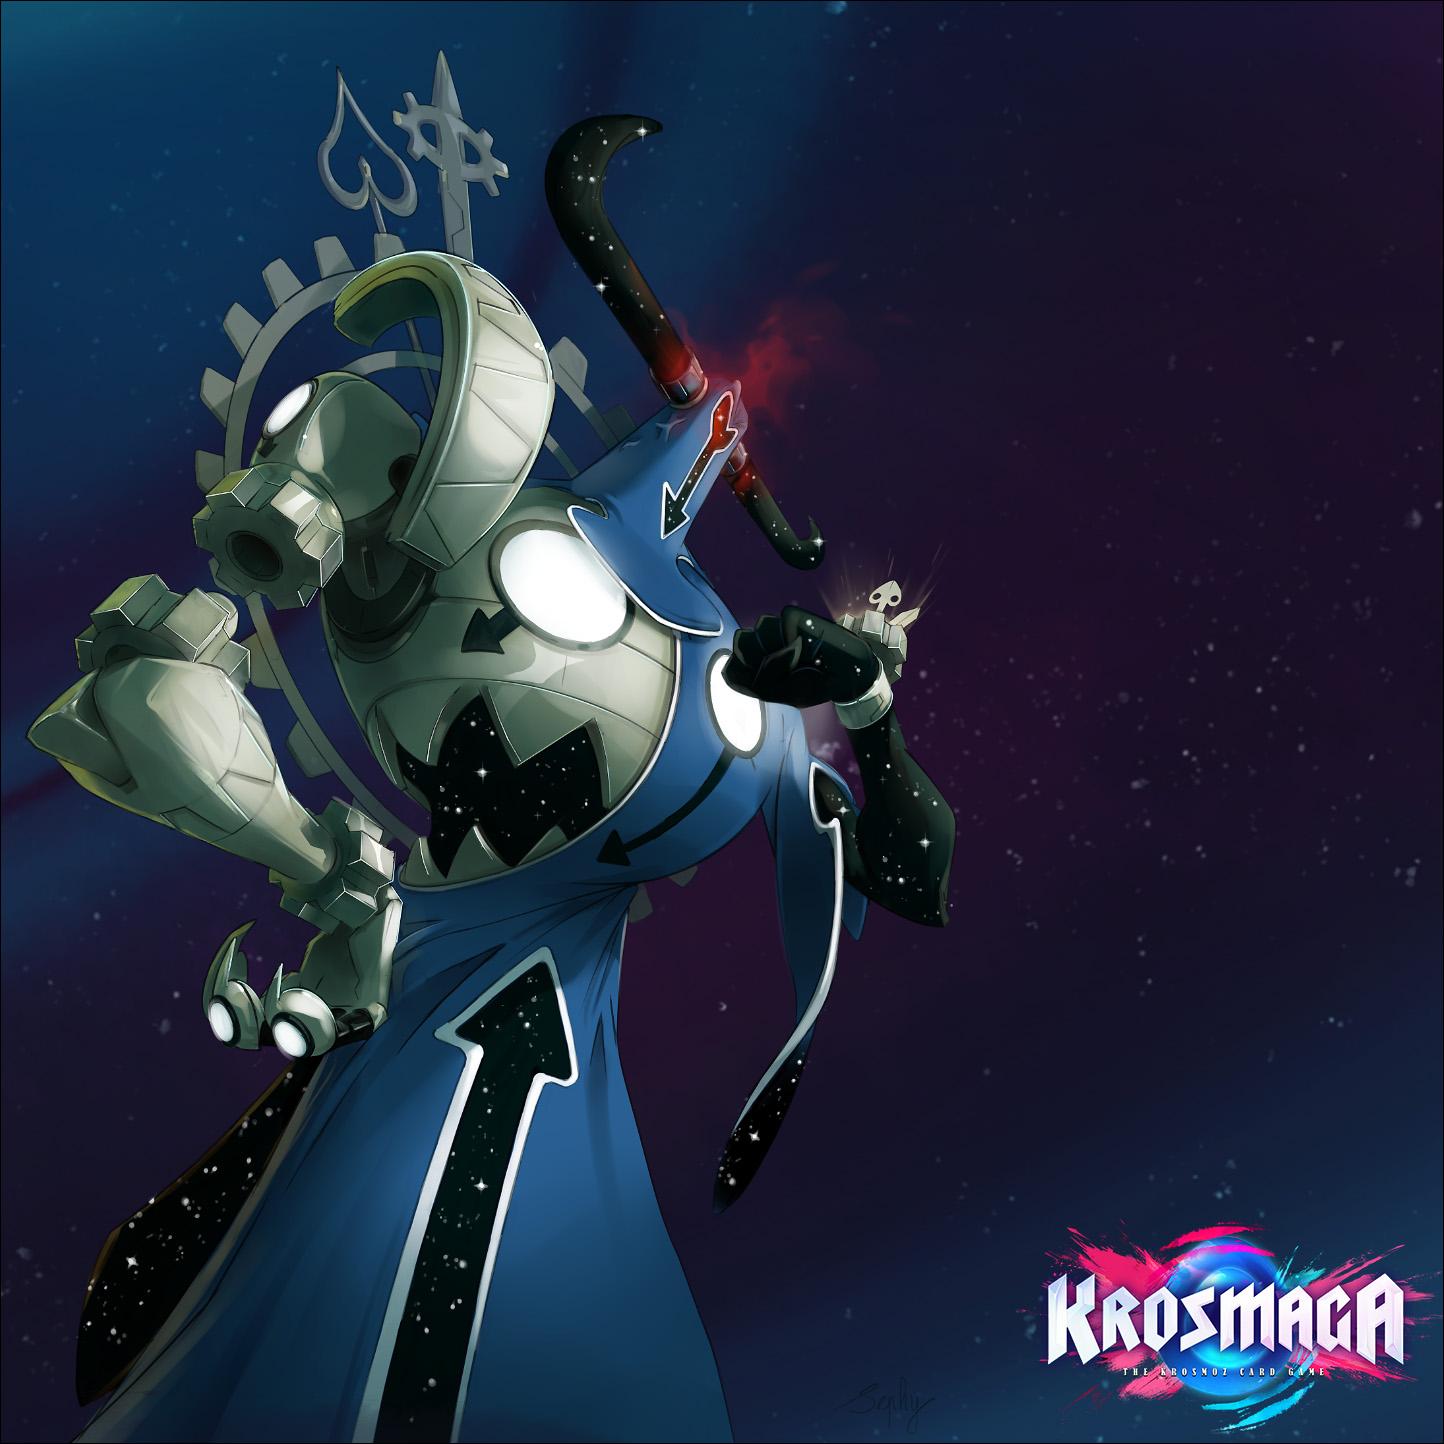 Krosmaga - God illustration: Xelor Versus.